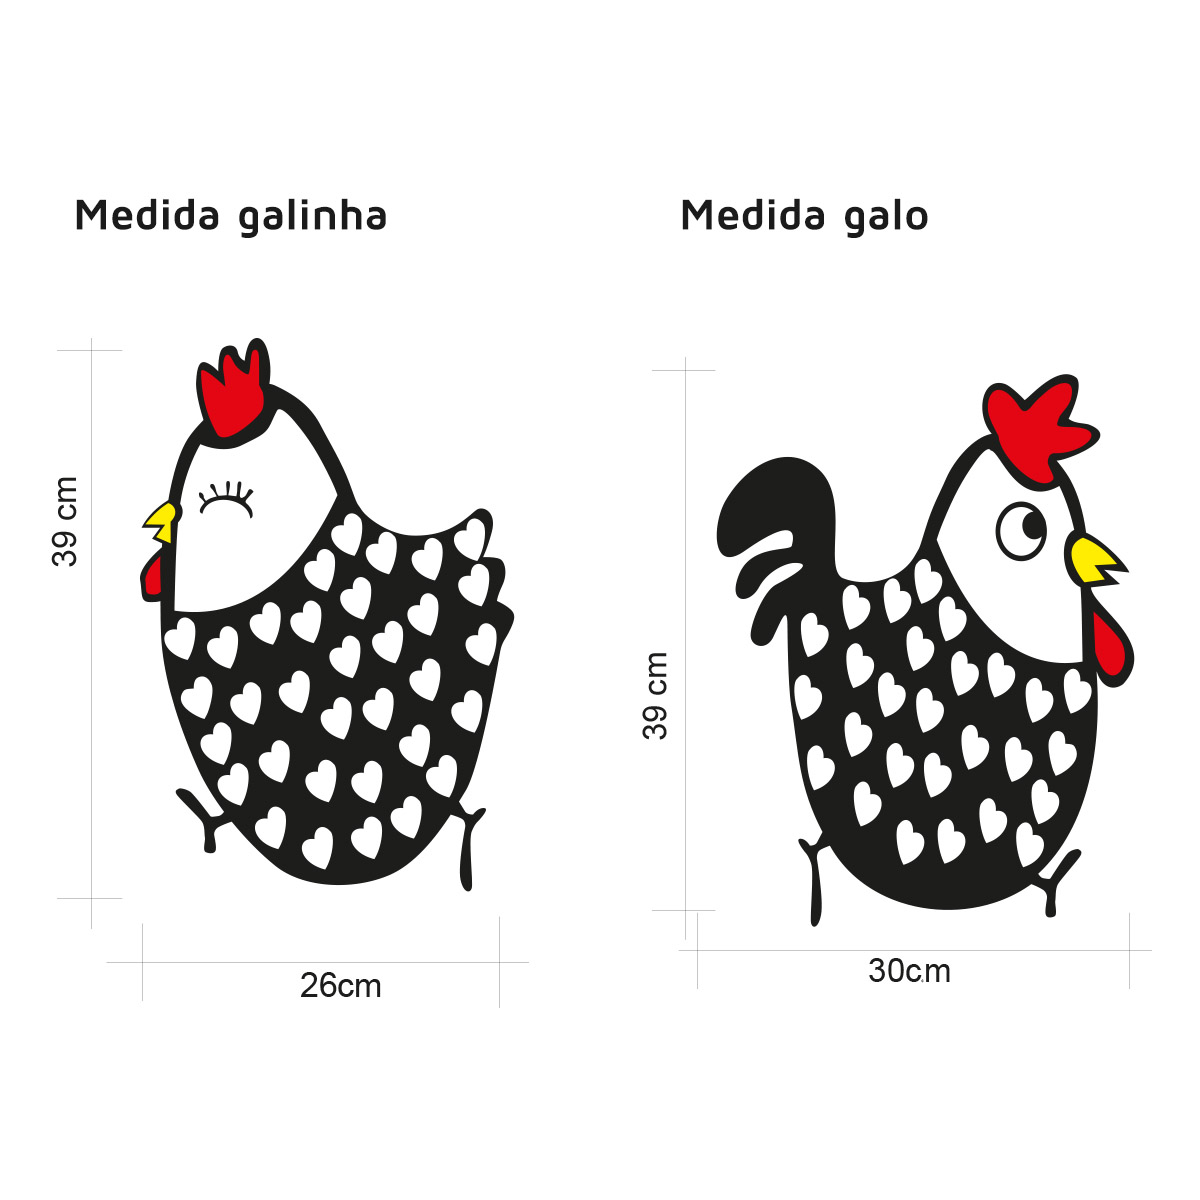 Adesivo de Geladeira KIT Casal Galinha D Angola